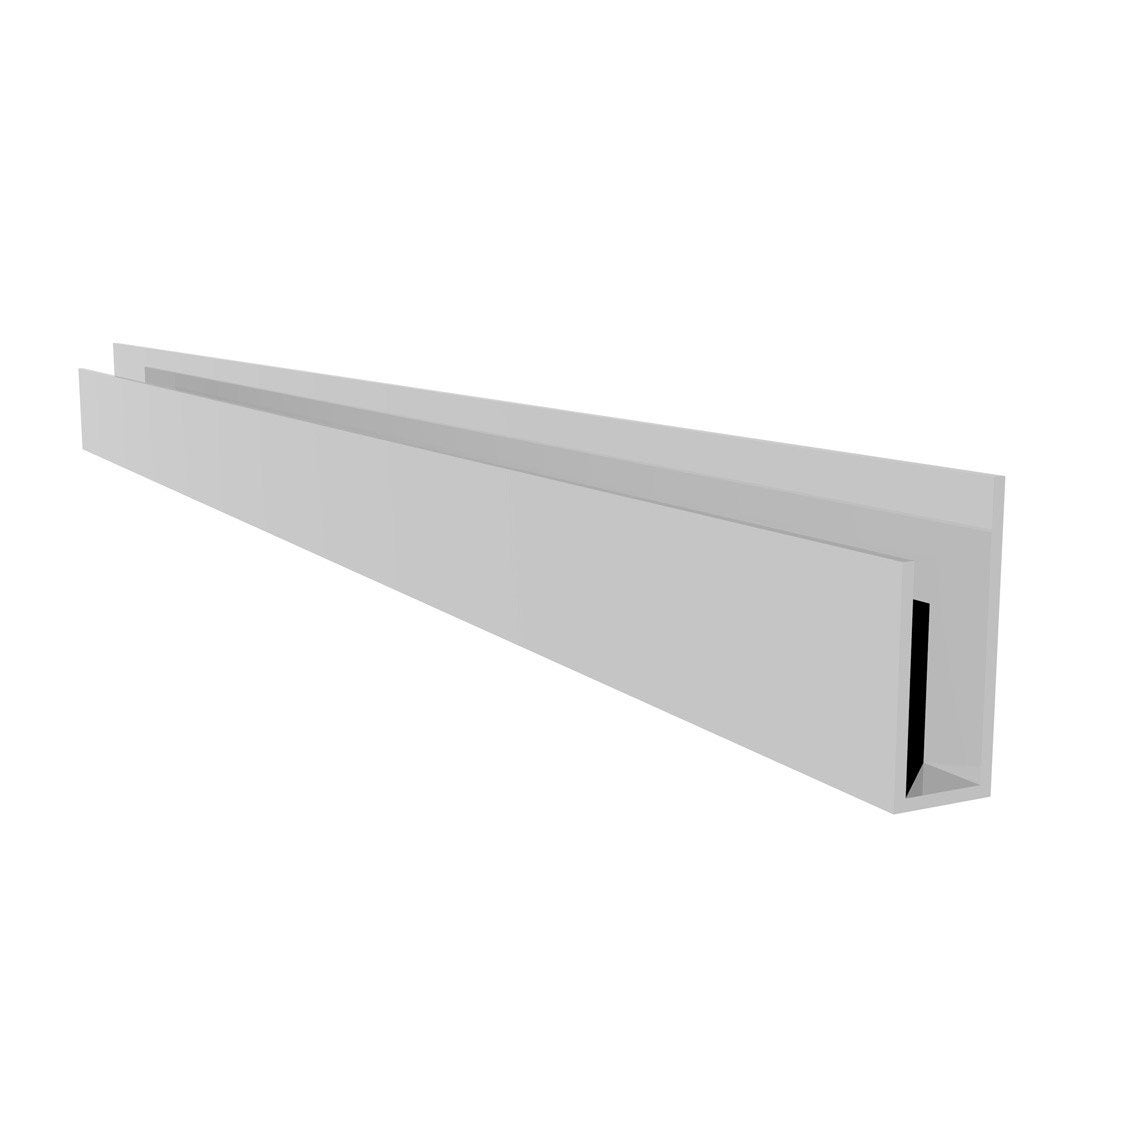 profil de d part u fsf1063 blanc pvc l 3 m x mm. Black Bedroom Furniture Sets. Home Design Ideas